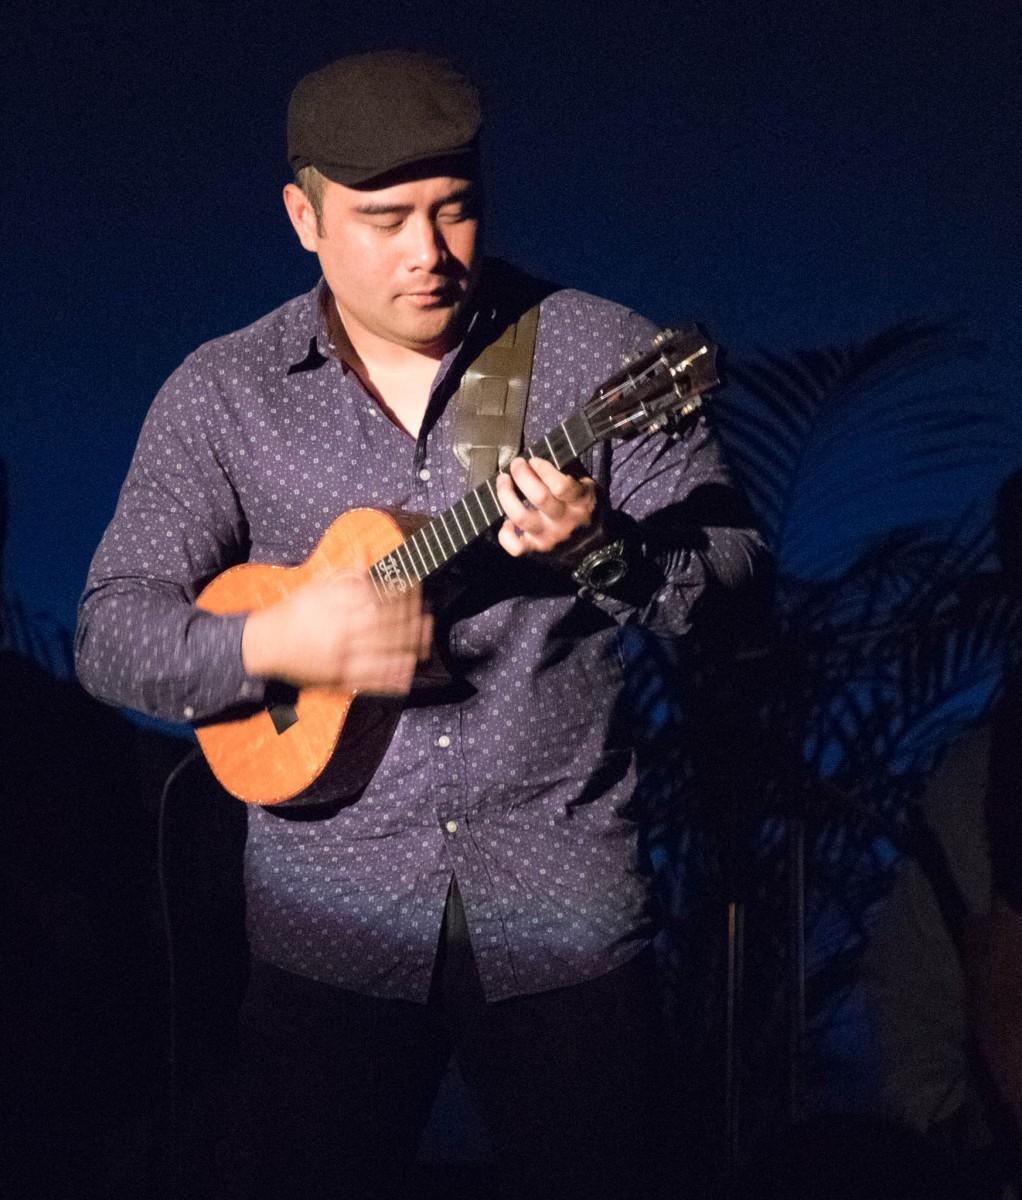 Royal Hawaiian Hotel Luau - World Renowned Ukulele Player